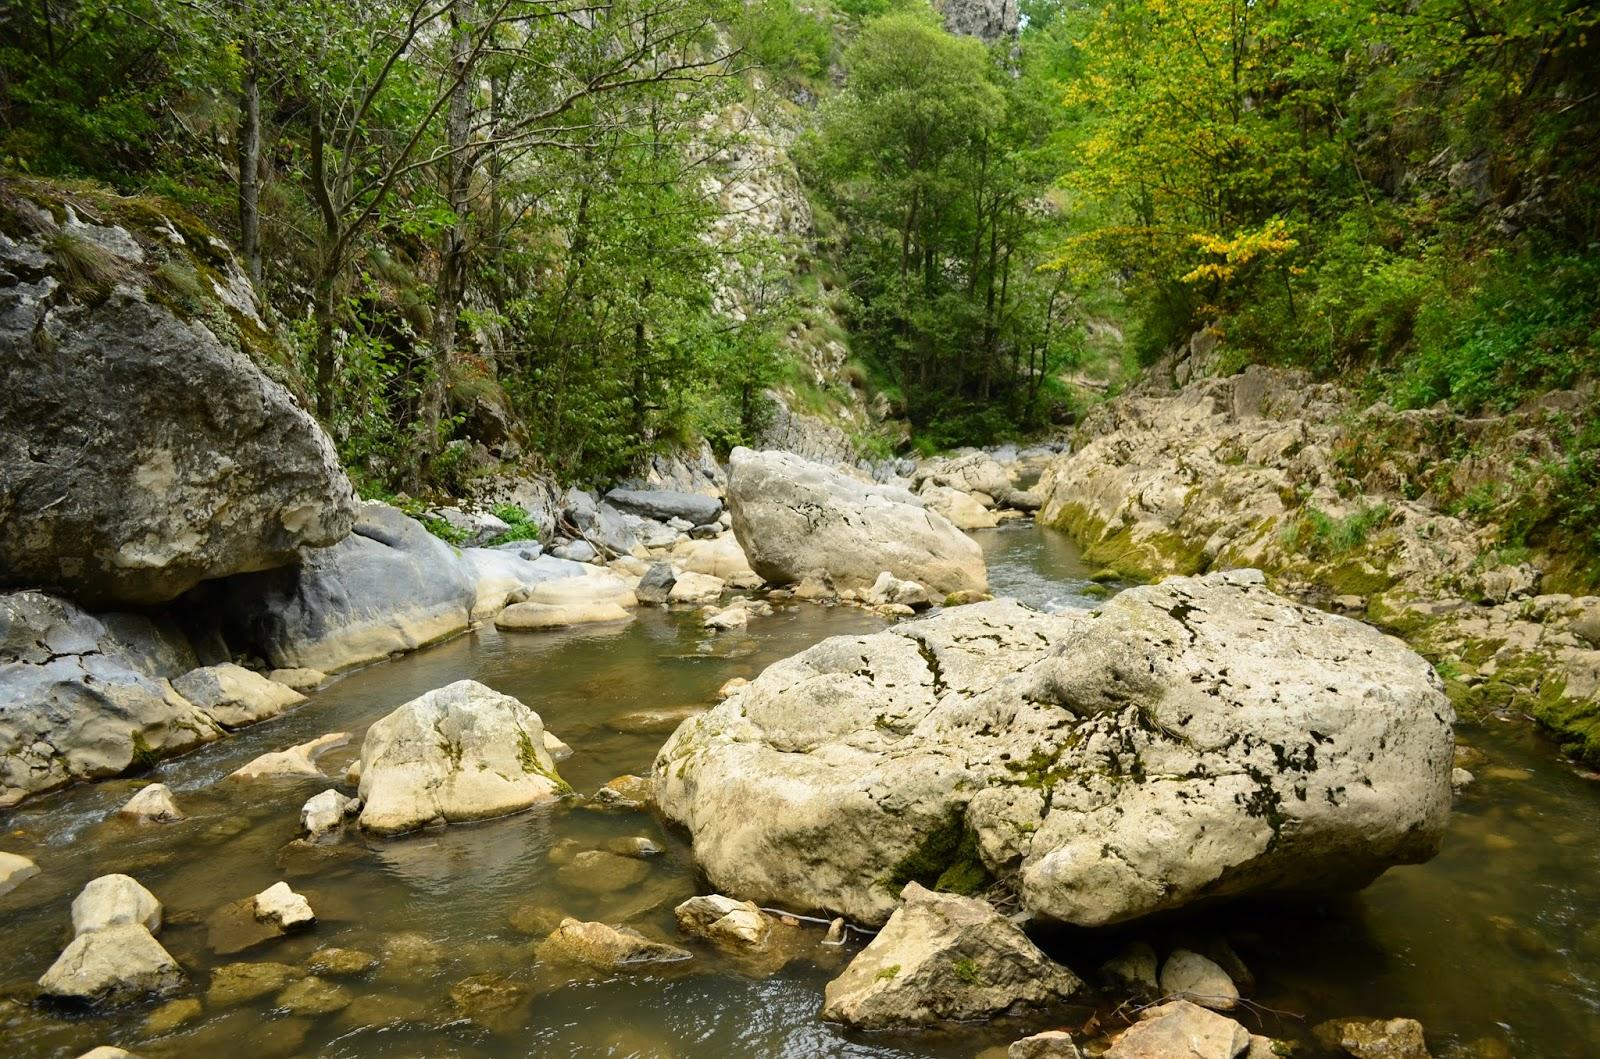 Cheile Rametului printre bolovani - Amazing Romania